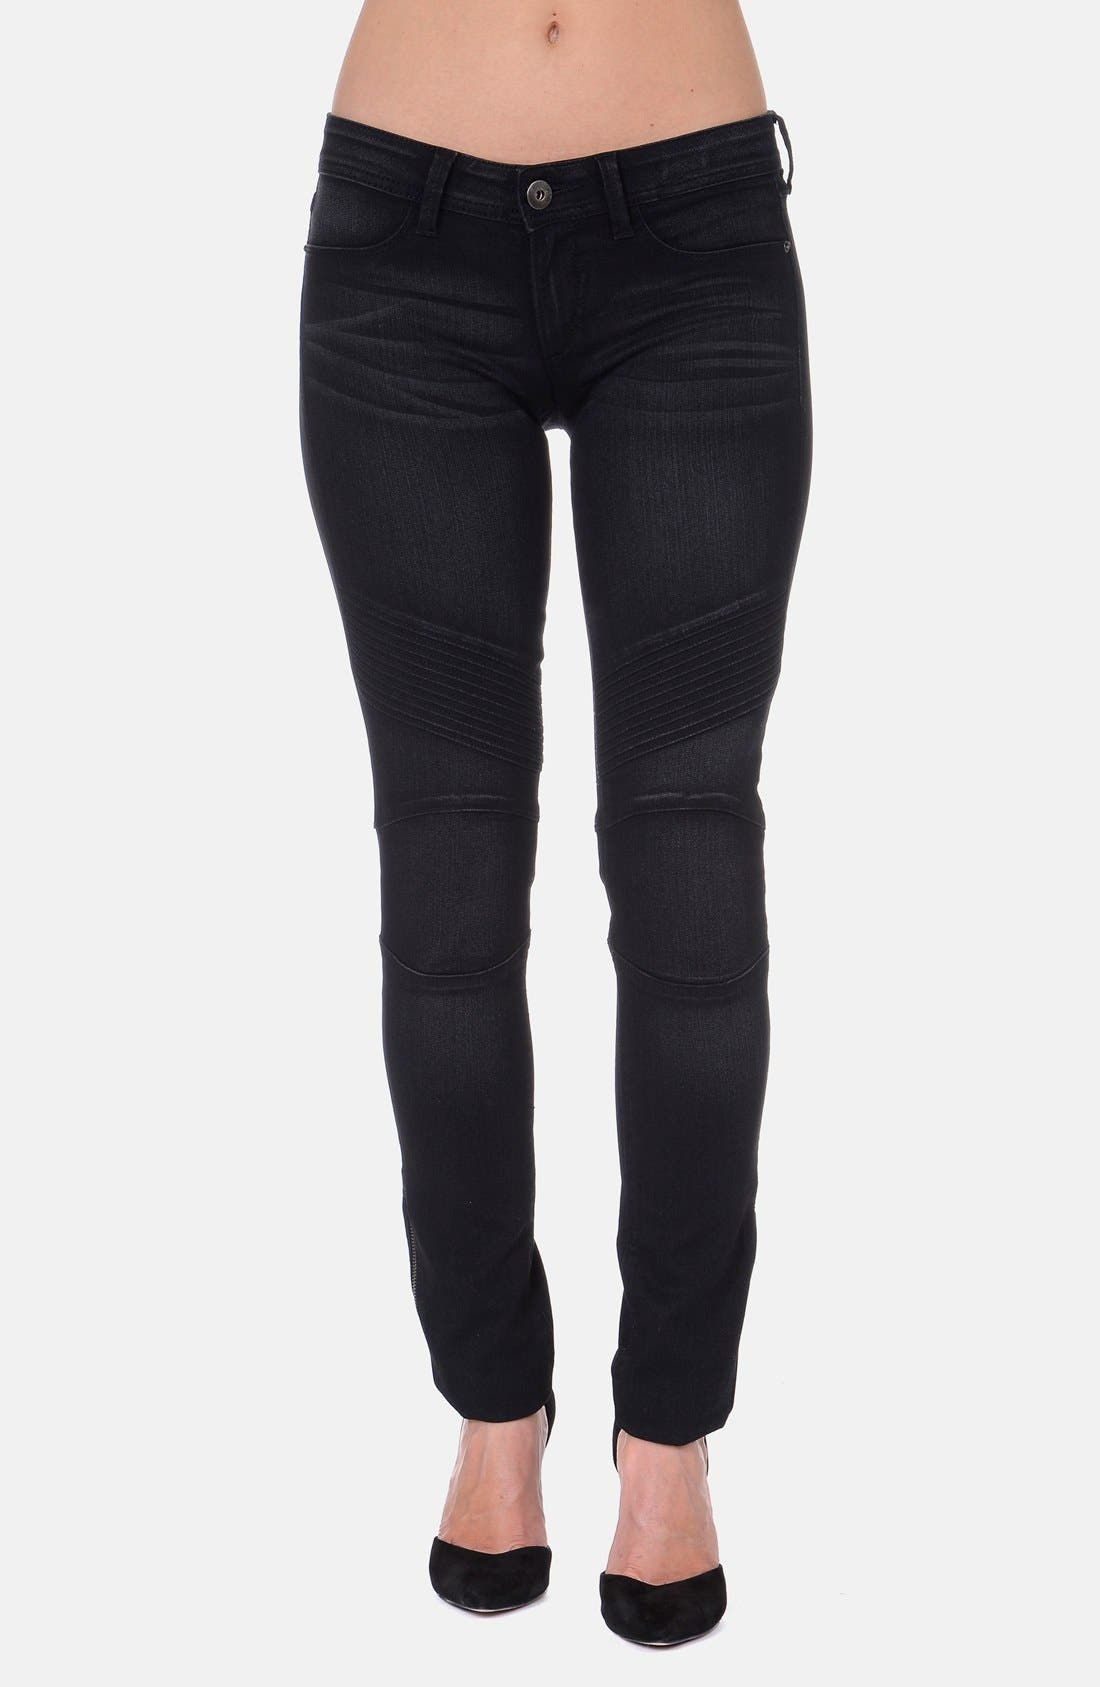 Main Image - DL1961 'Hazel' Moto Skinny Jeans (Harley)